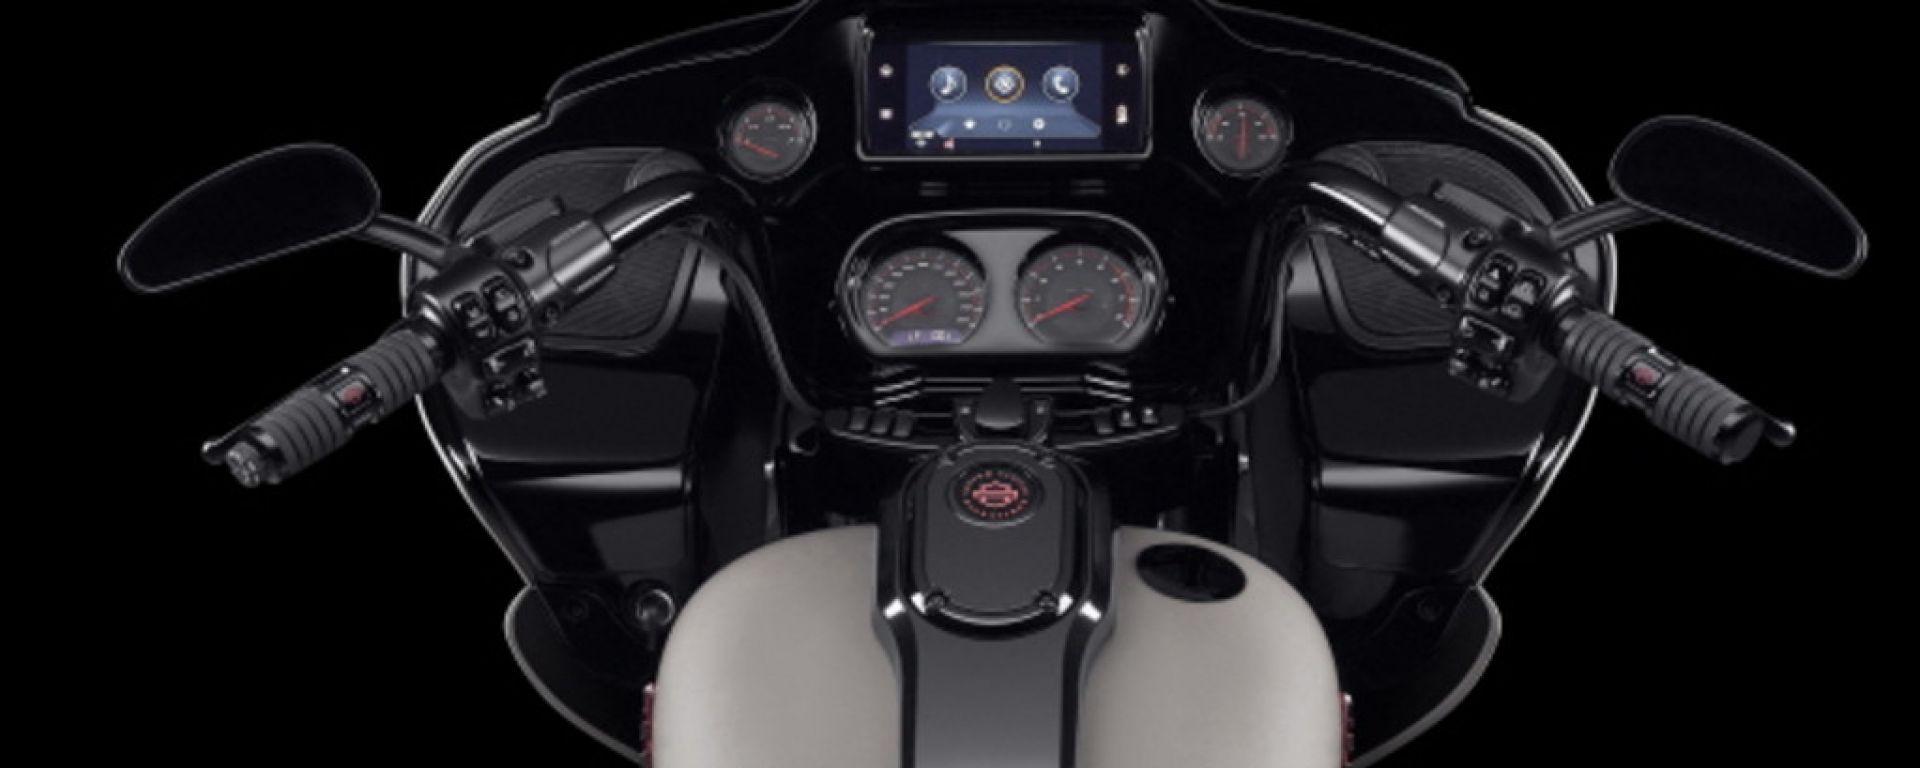 Android Auto su Harley-Davidson